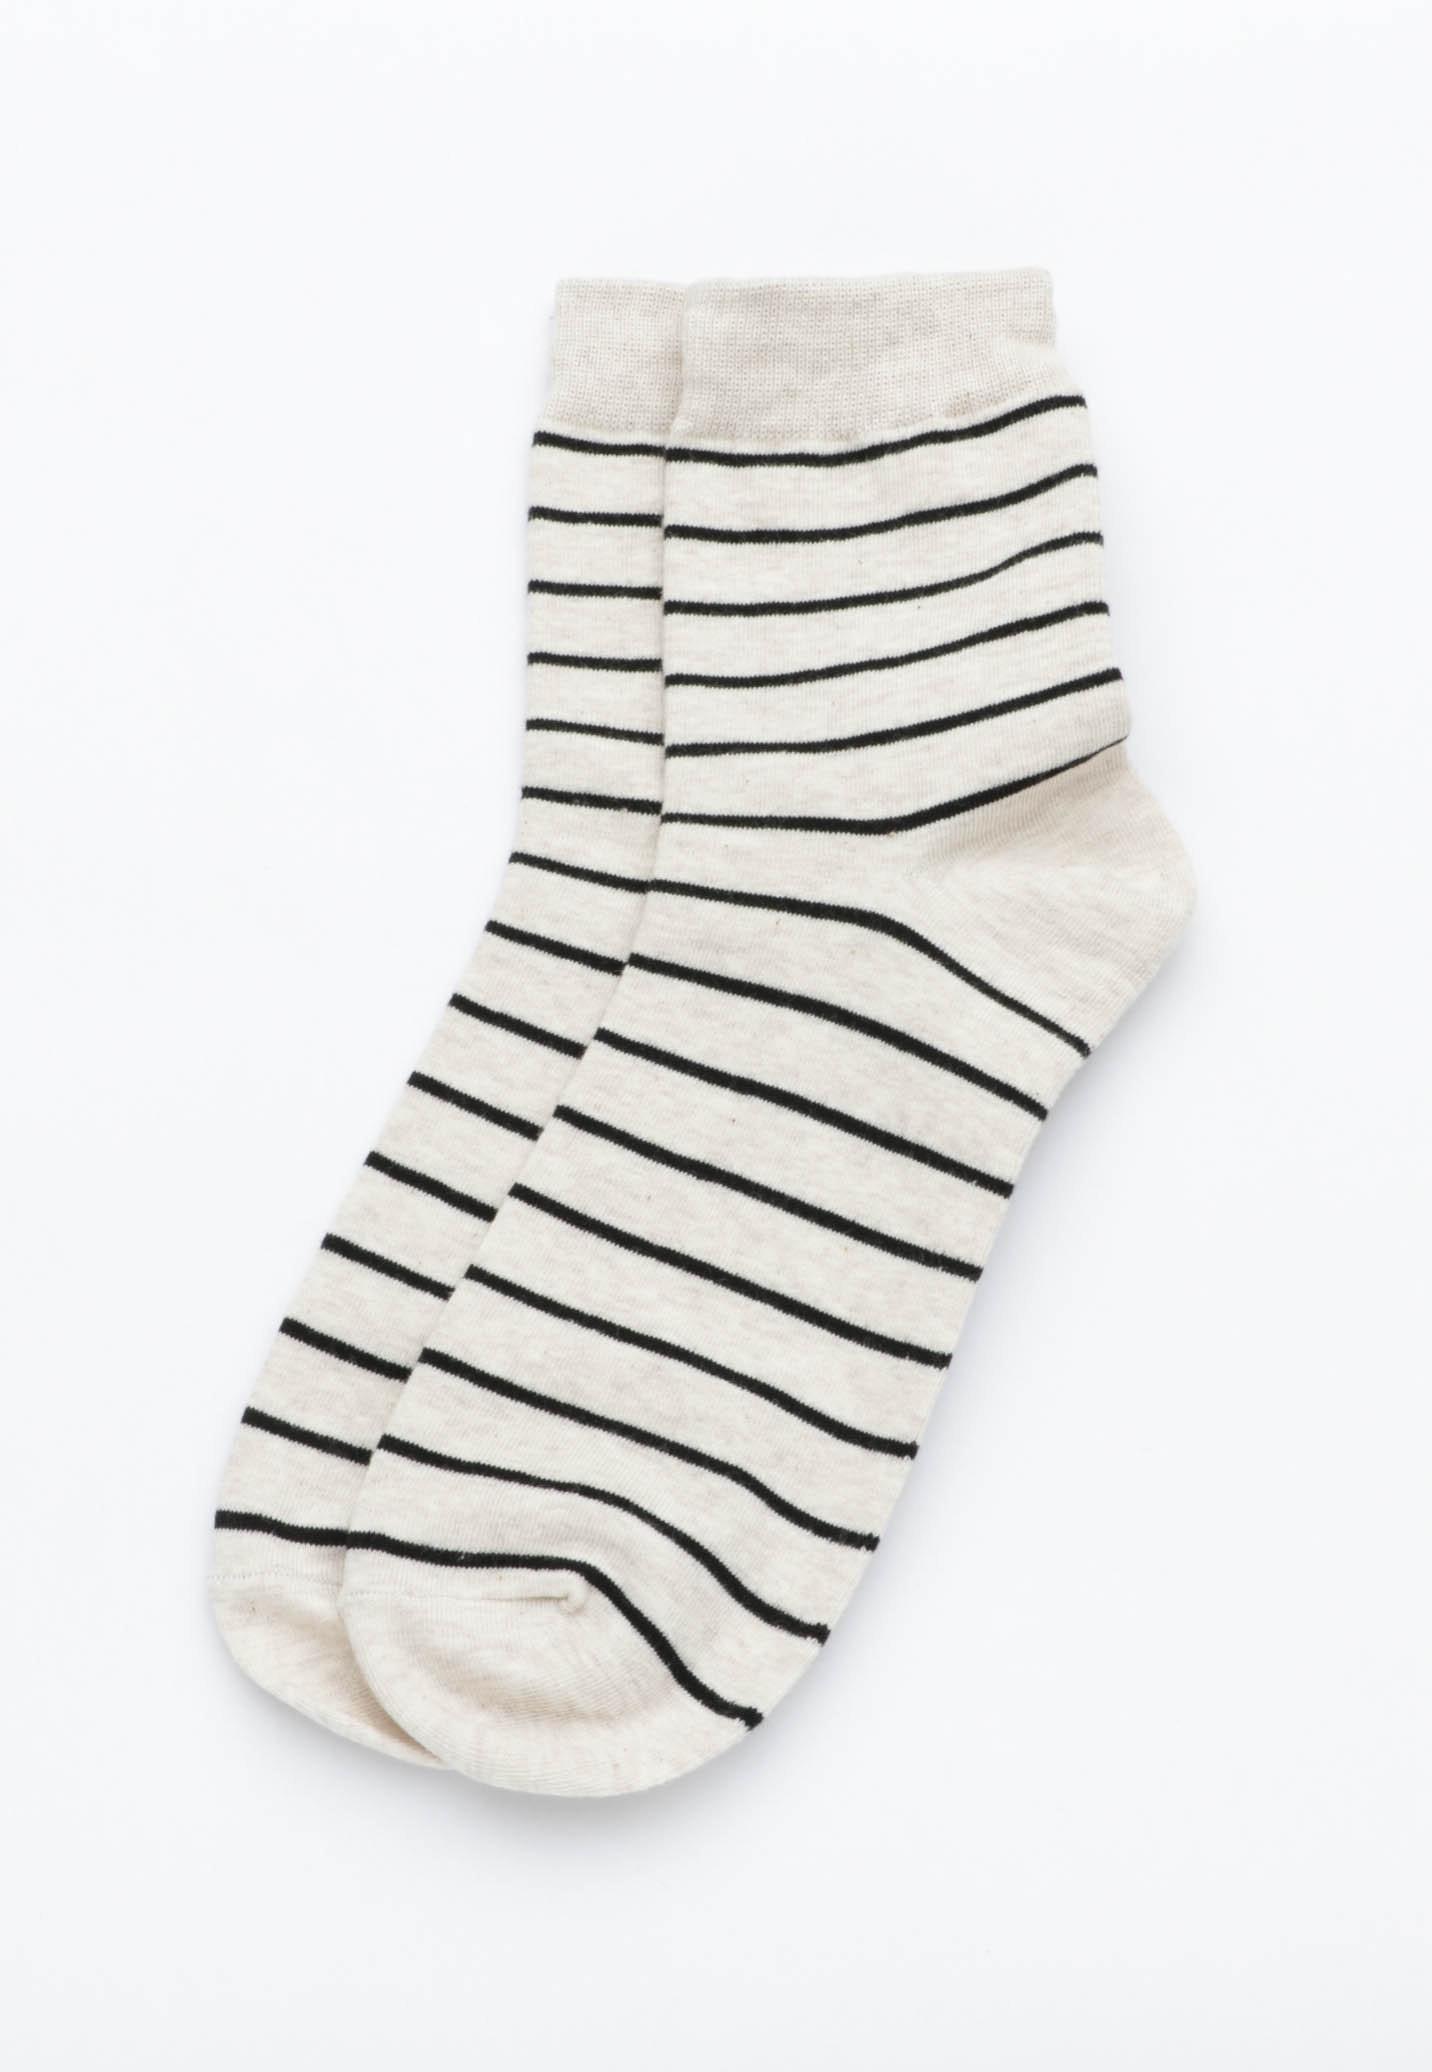 Stripe Socks - Oatmeal